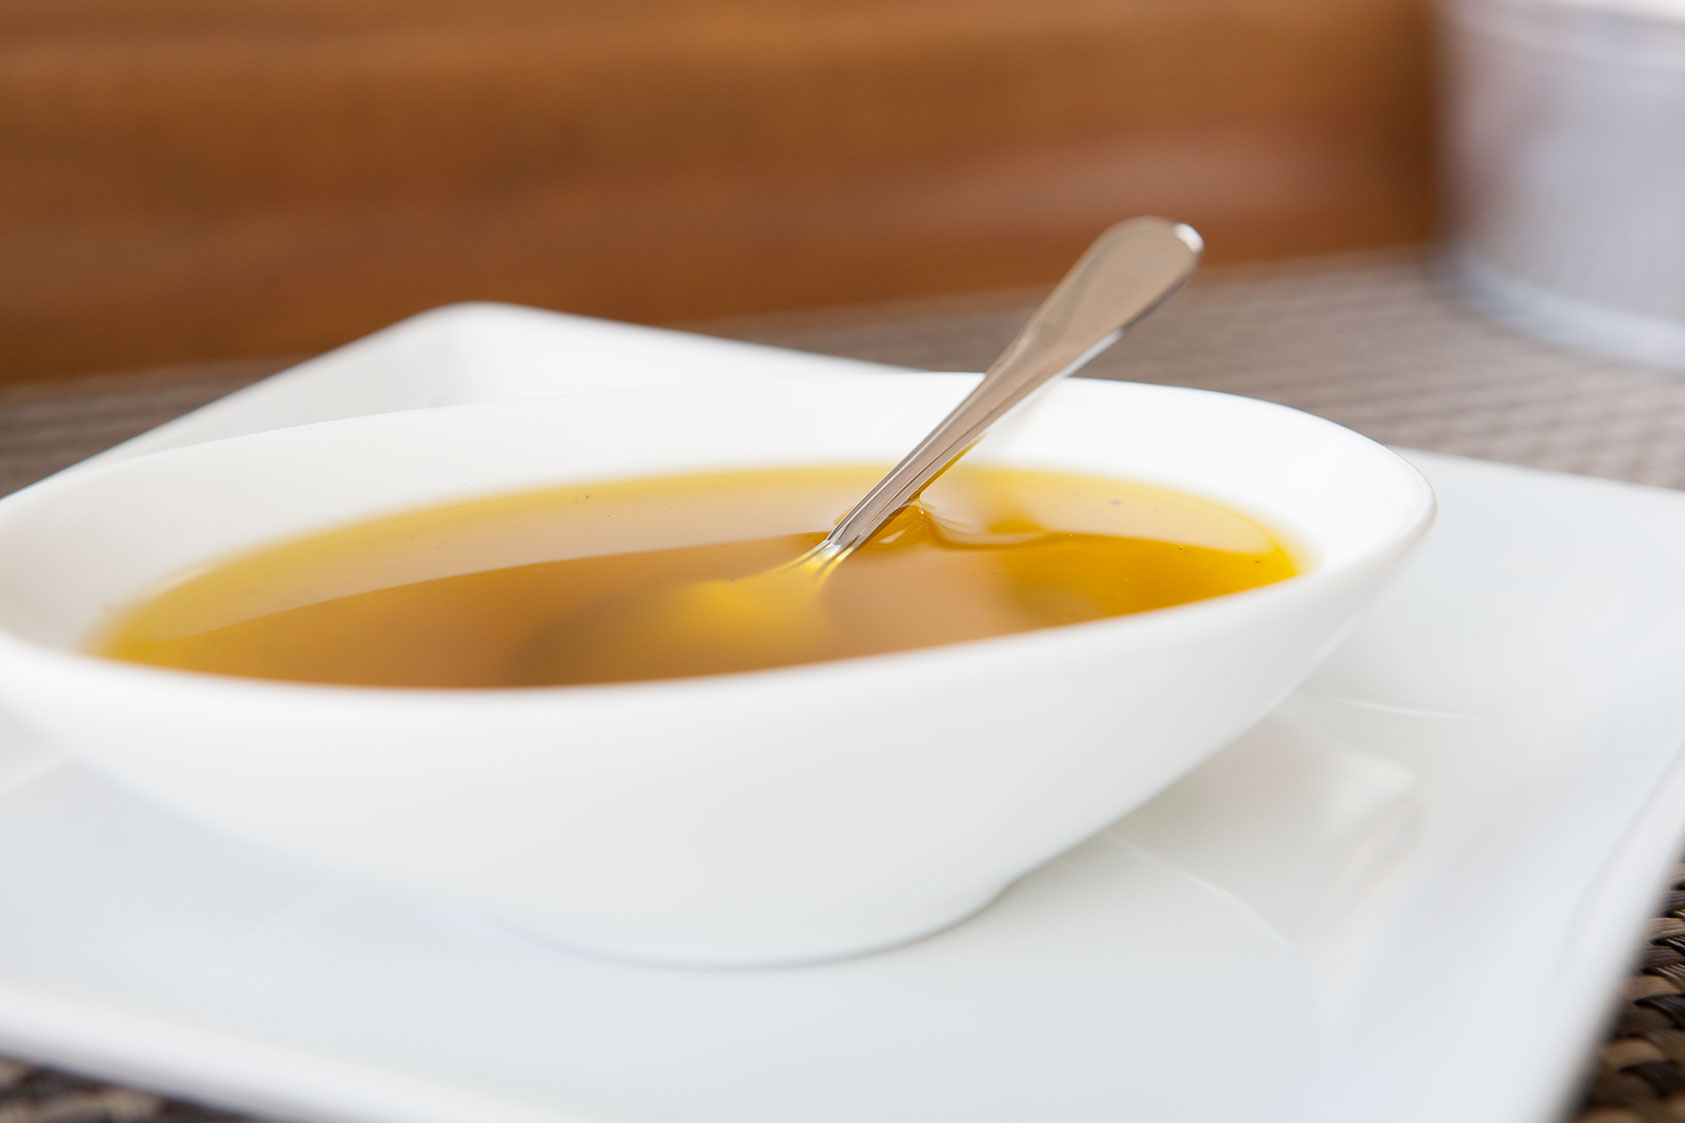 How-To: Lemon Garlic Vinaigrette - by AmazingPaleo.com